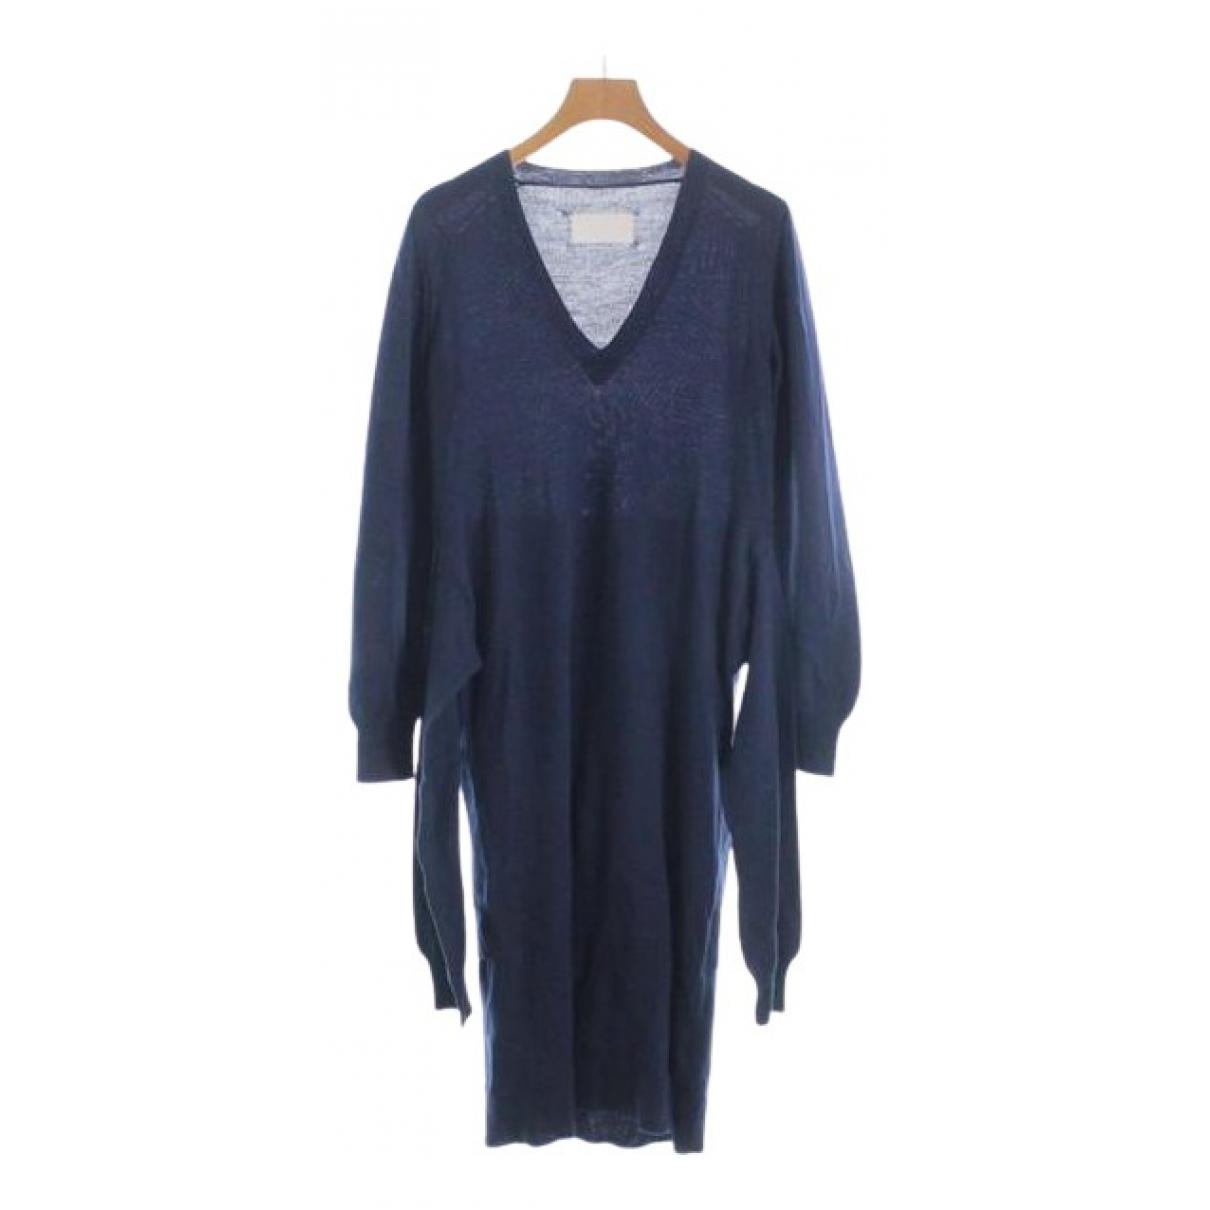 Maison Martin Margiela \N Kleid in  Blau Wolle